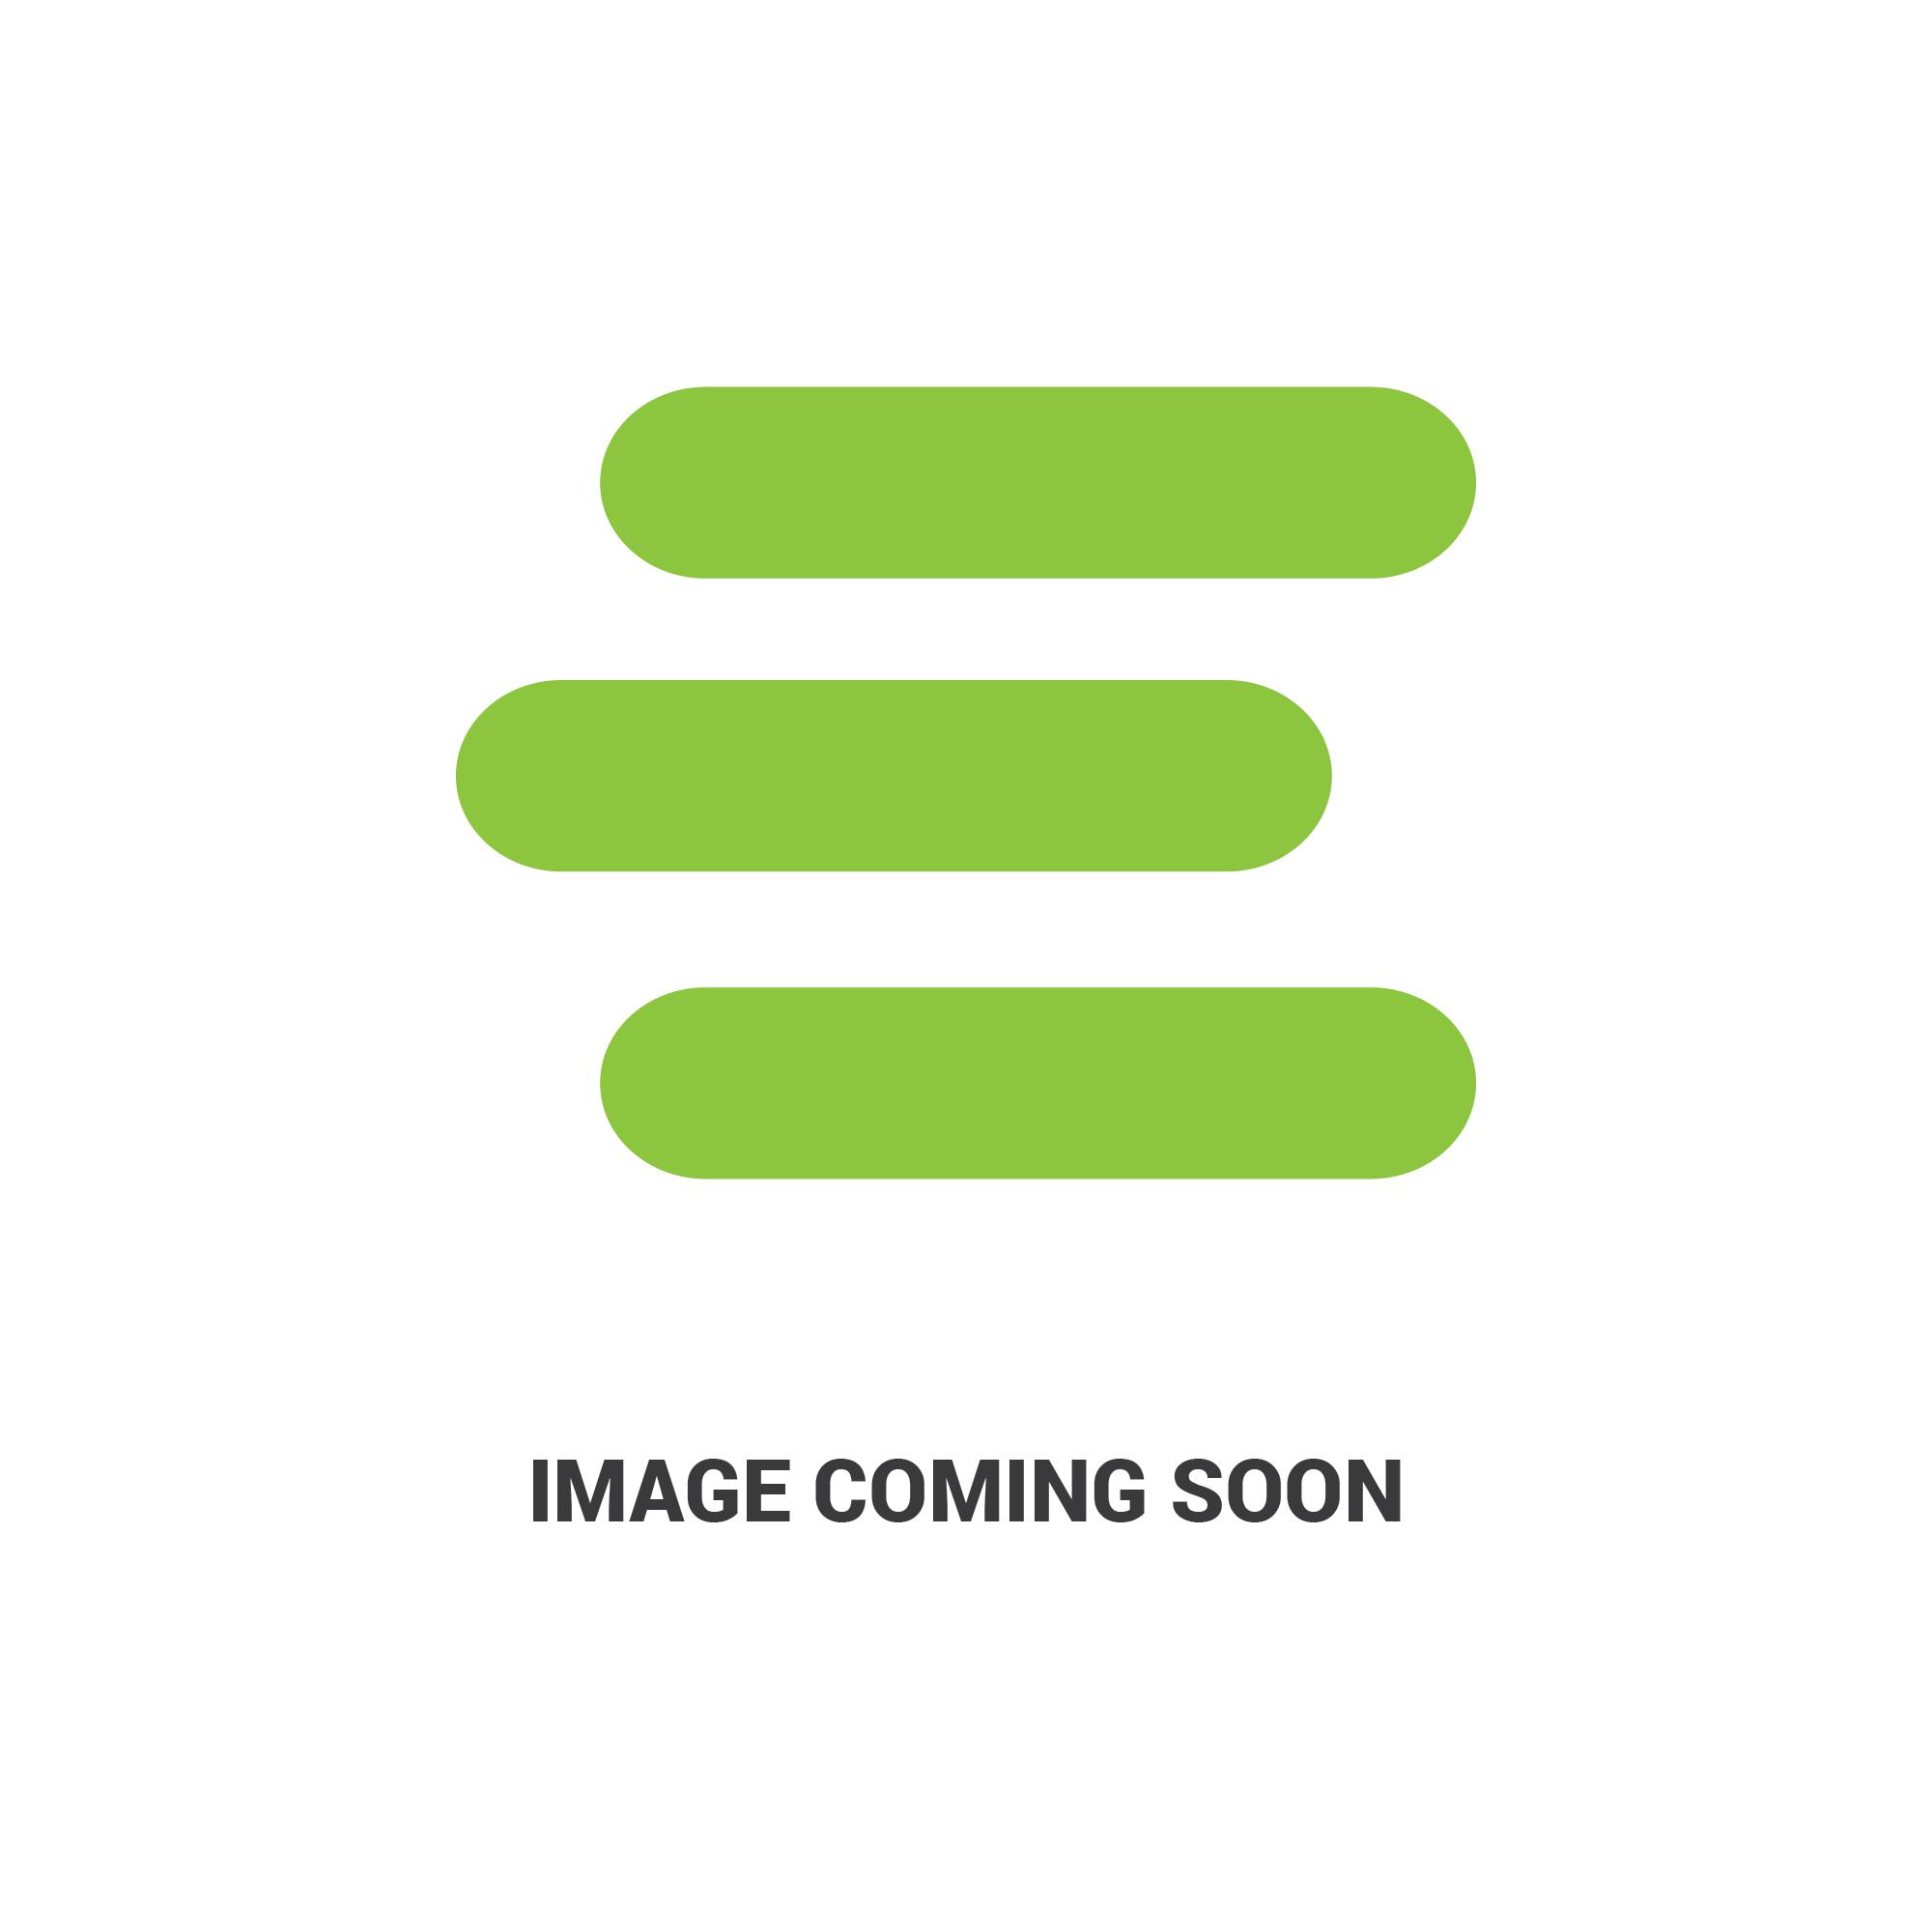 E-526216BHedit 2.jpg